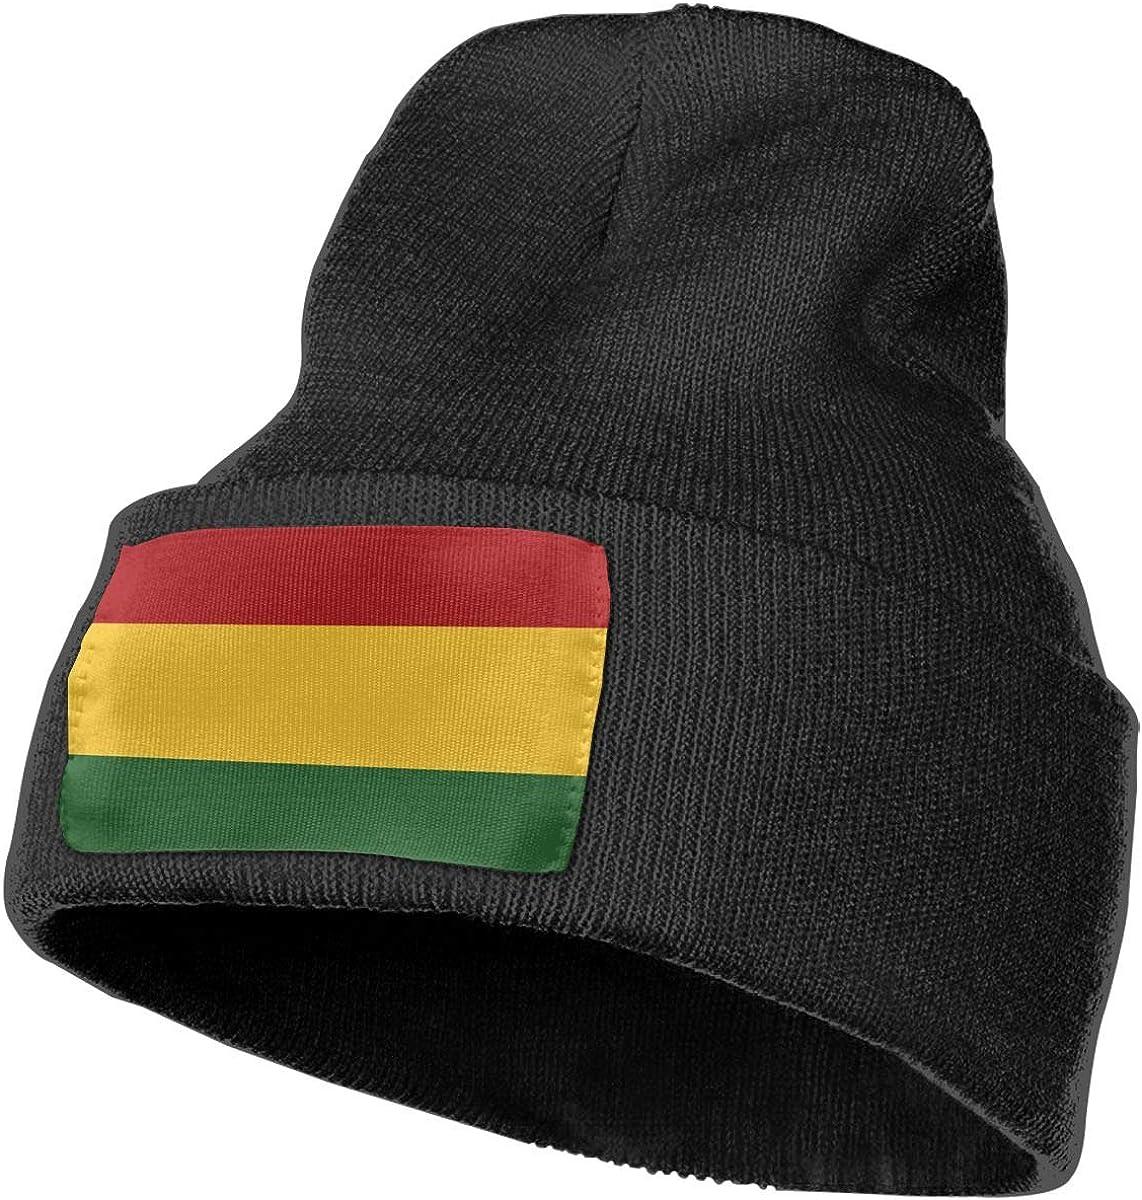 COLLJL-8 Unisex Rasta Flag Outdoor Fashion Knit Beanies Hat Soft Winter Knit Caps